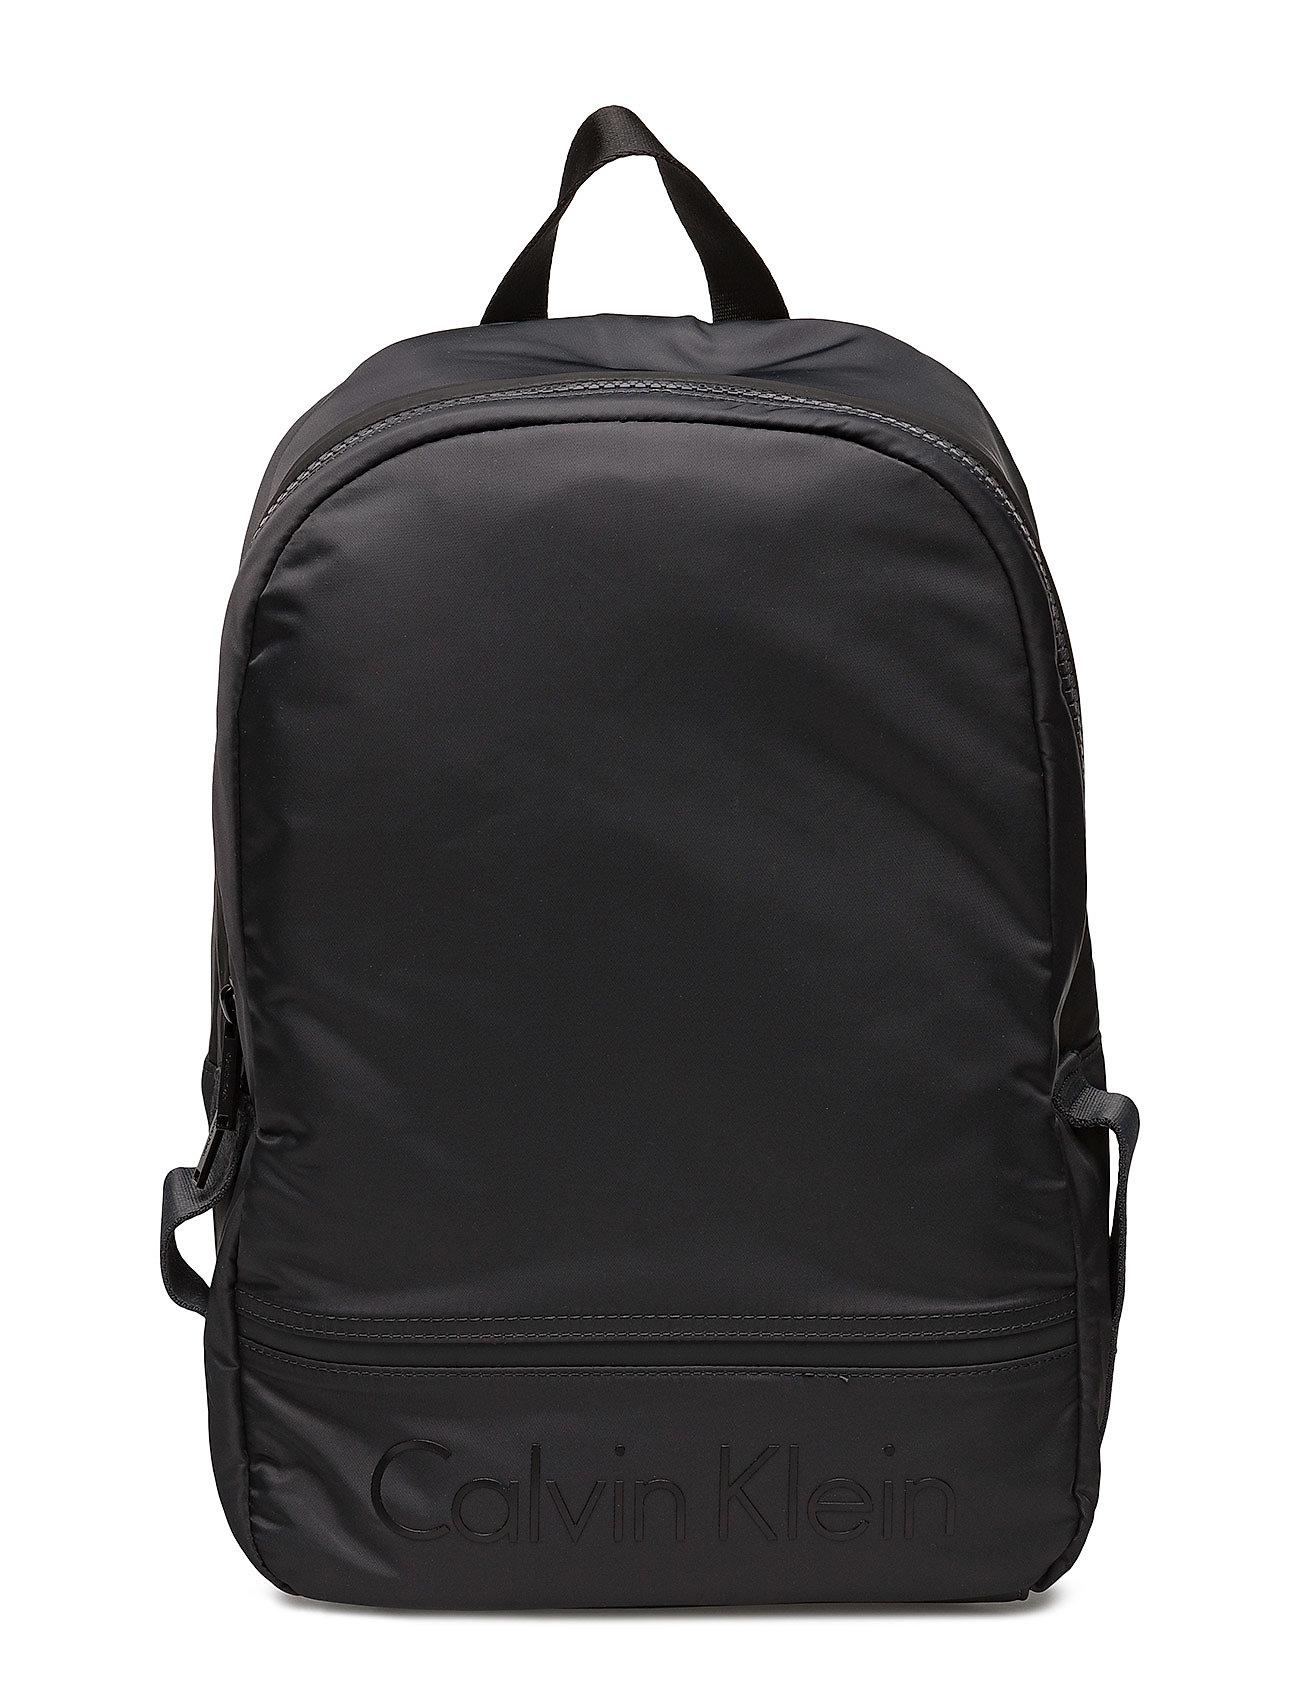 matthew backpack dark shadow 720 kr calvin klein. Black Bedroom Furniture Sets. Home Design Ideas